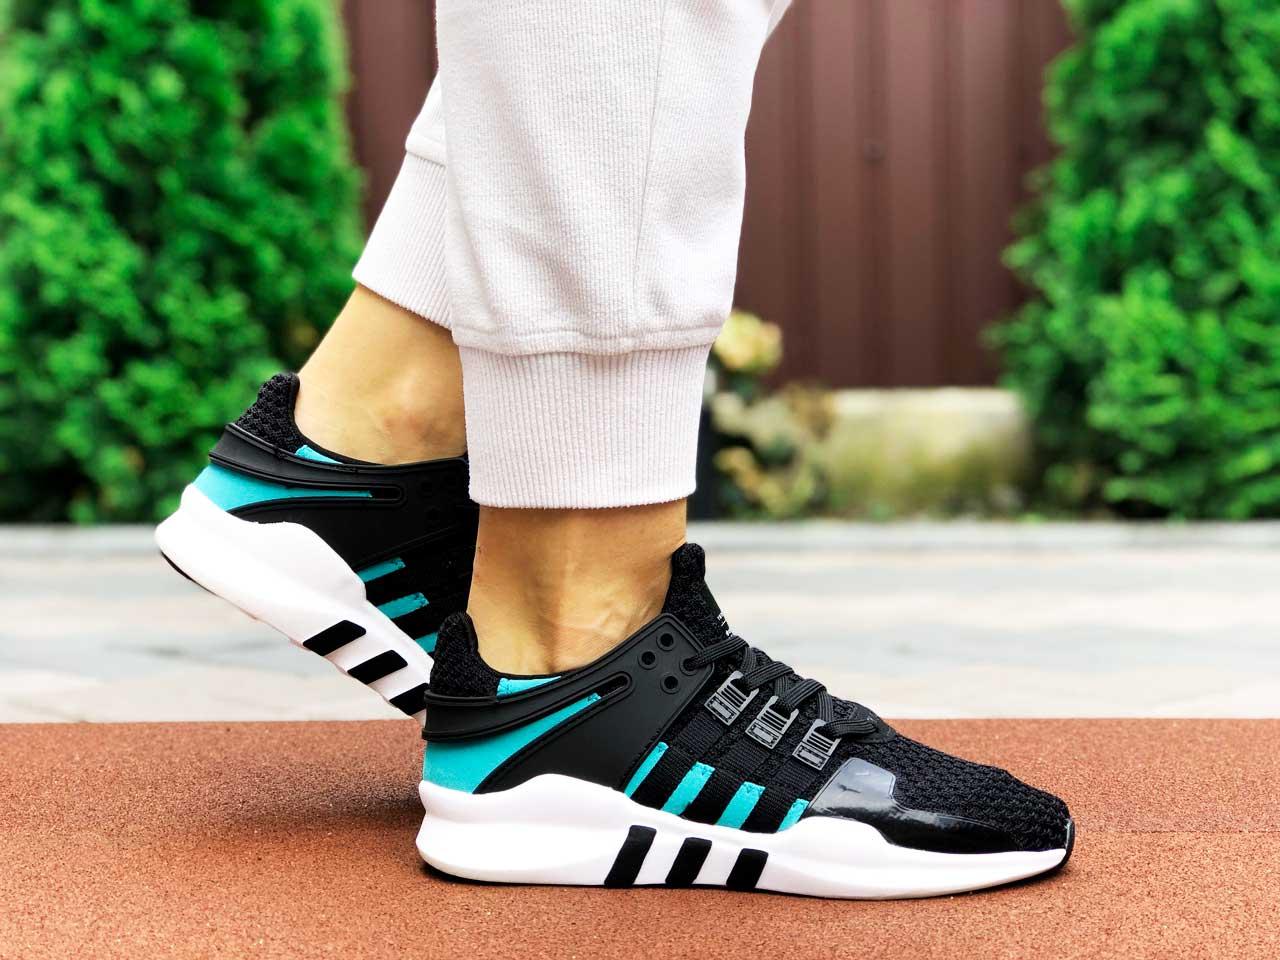 Adidas Equipment (EQT) Running